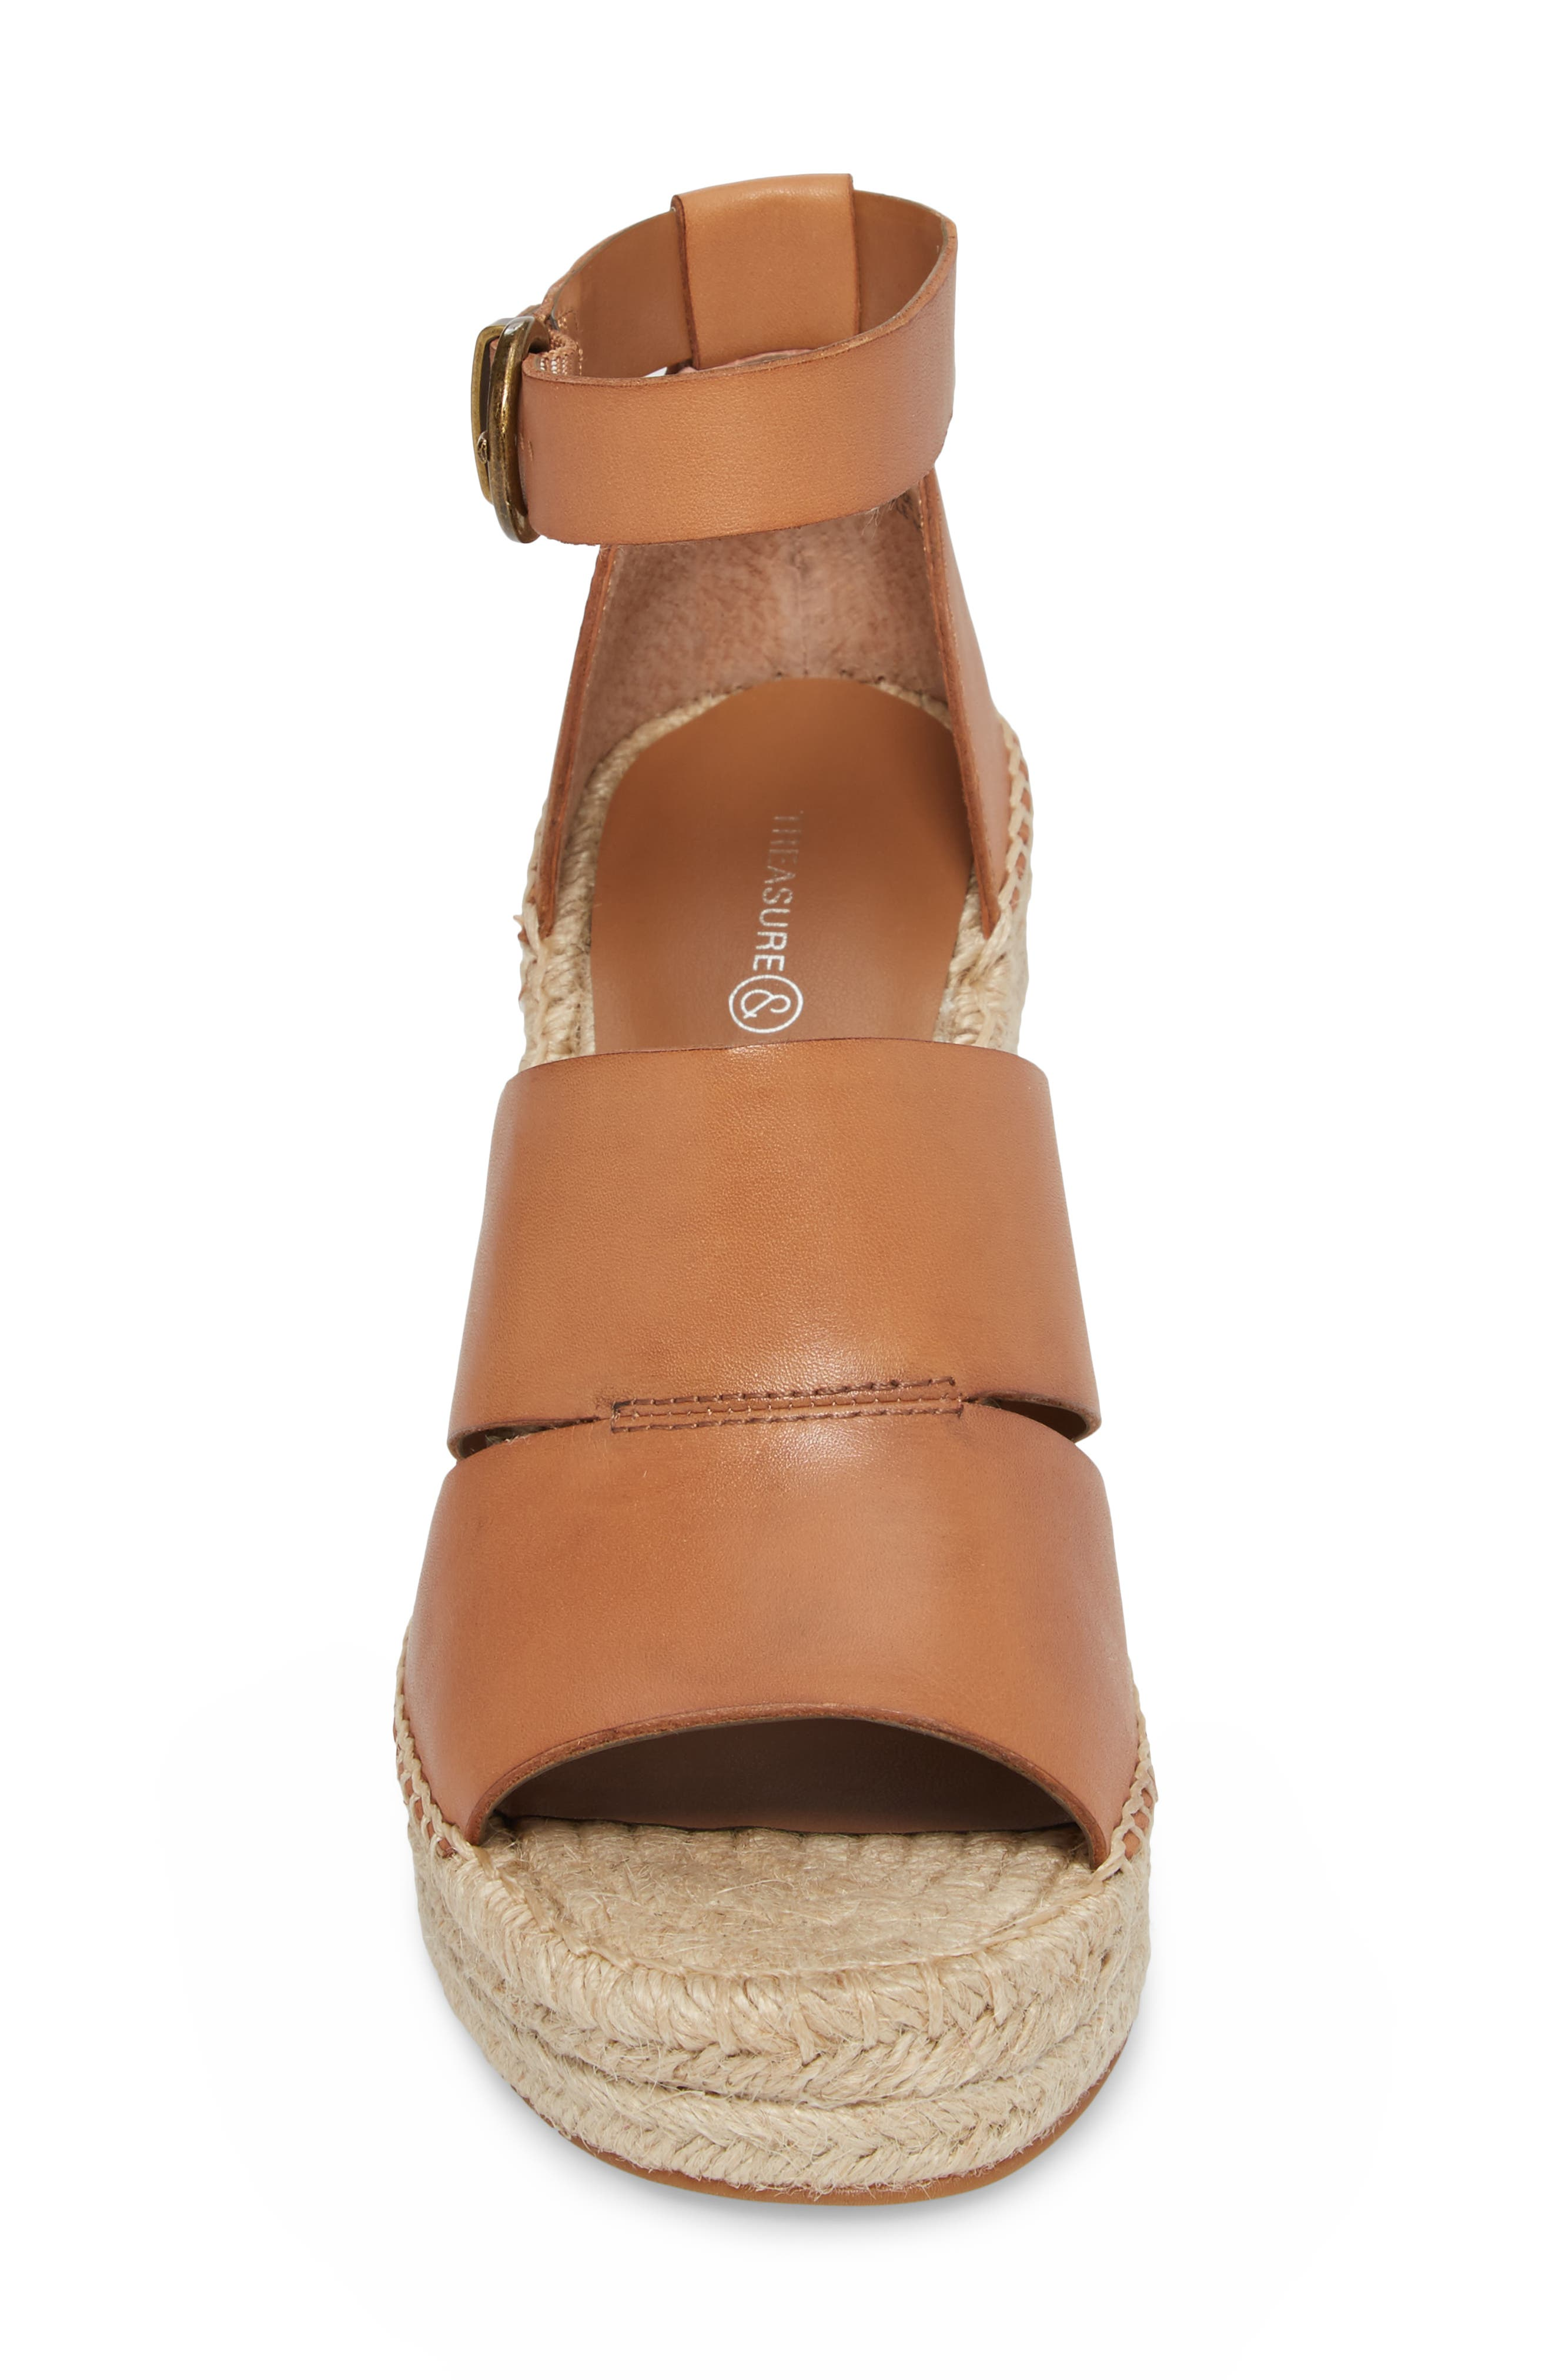 TREASURE & BOND, Sannibel Platform Wedge Sandal, Alternate thumbnail 4, color, TAN LEATHER